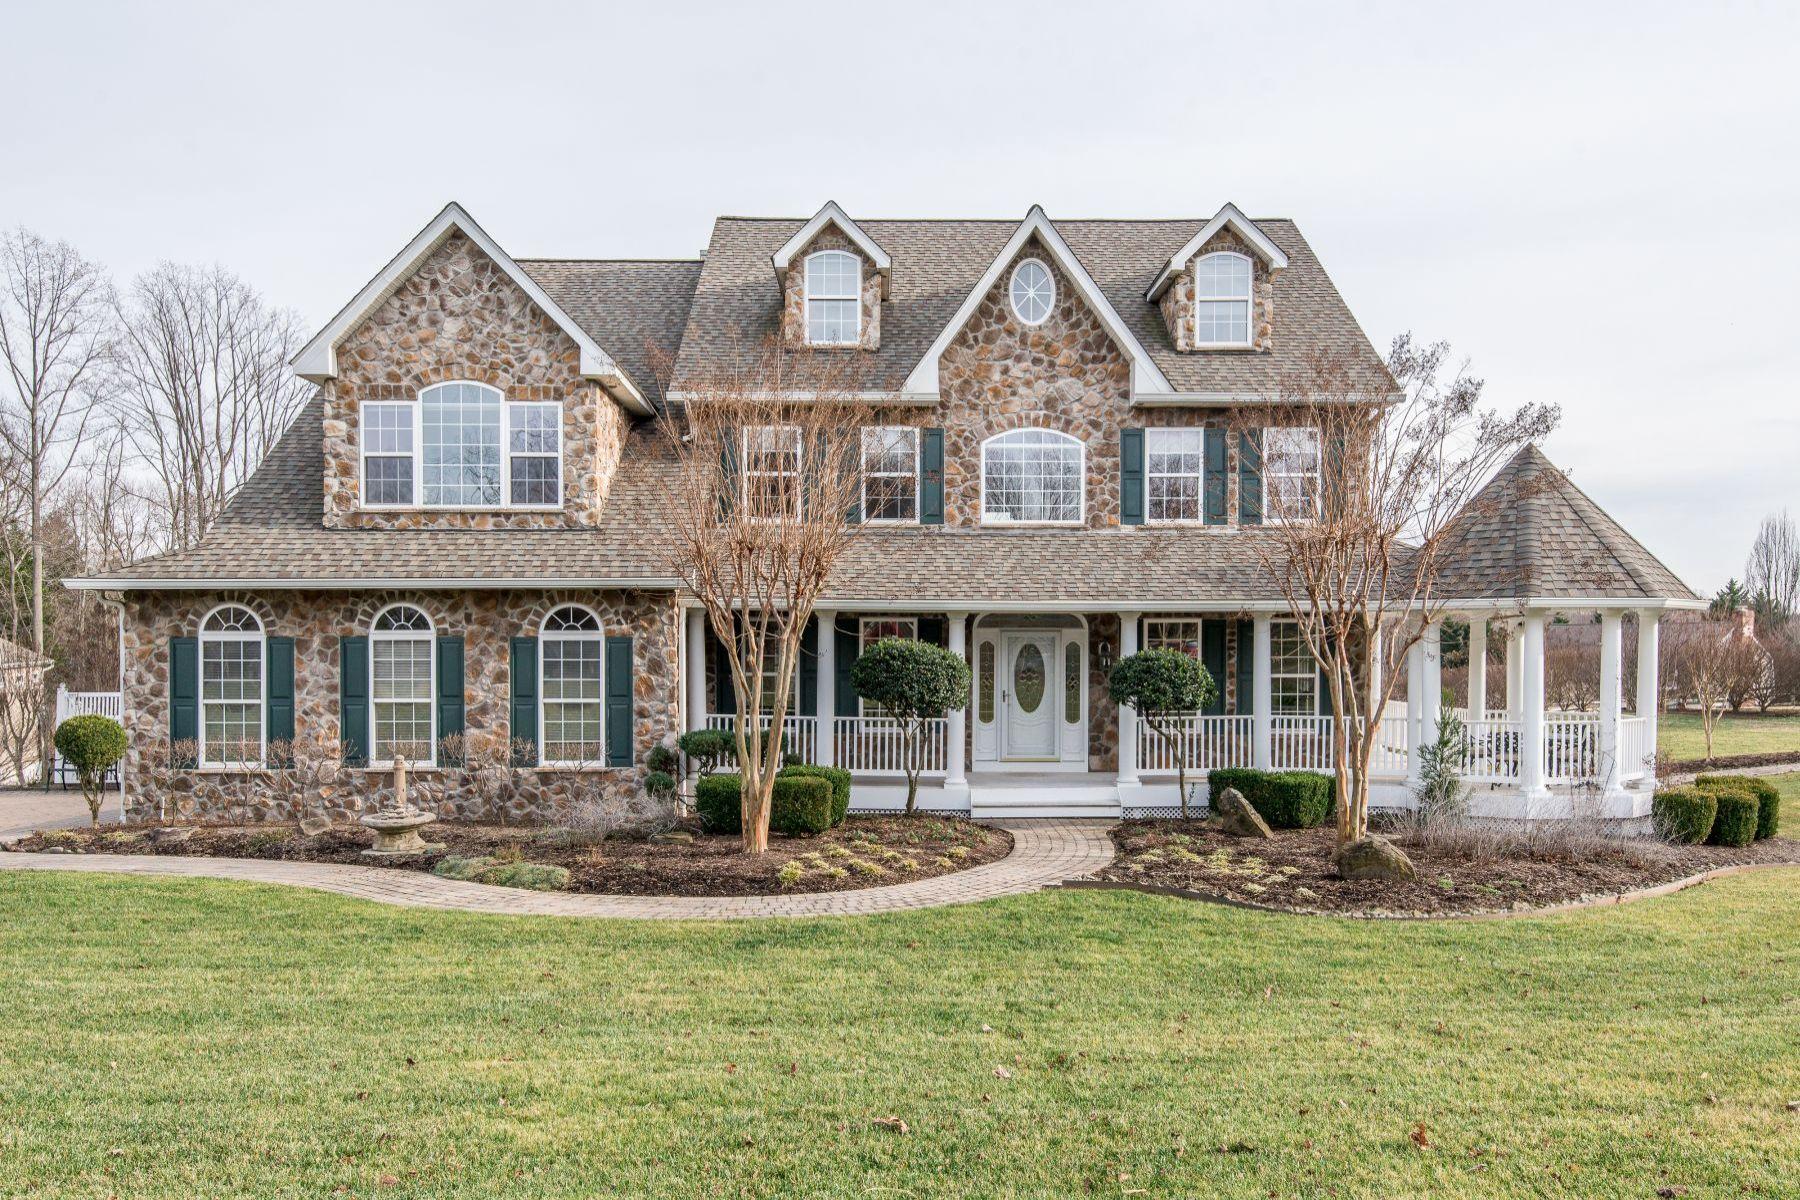 Single Family Home for Sale at 17 Harwood Drive, Harwood Harwood, Maryland 20776 United States